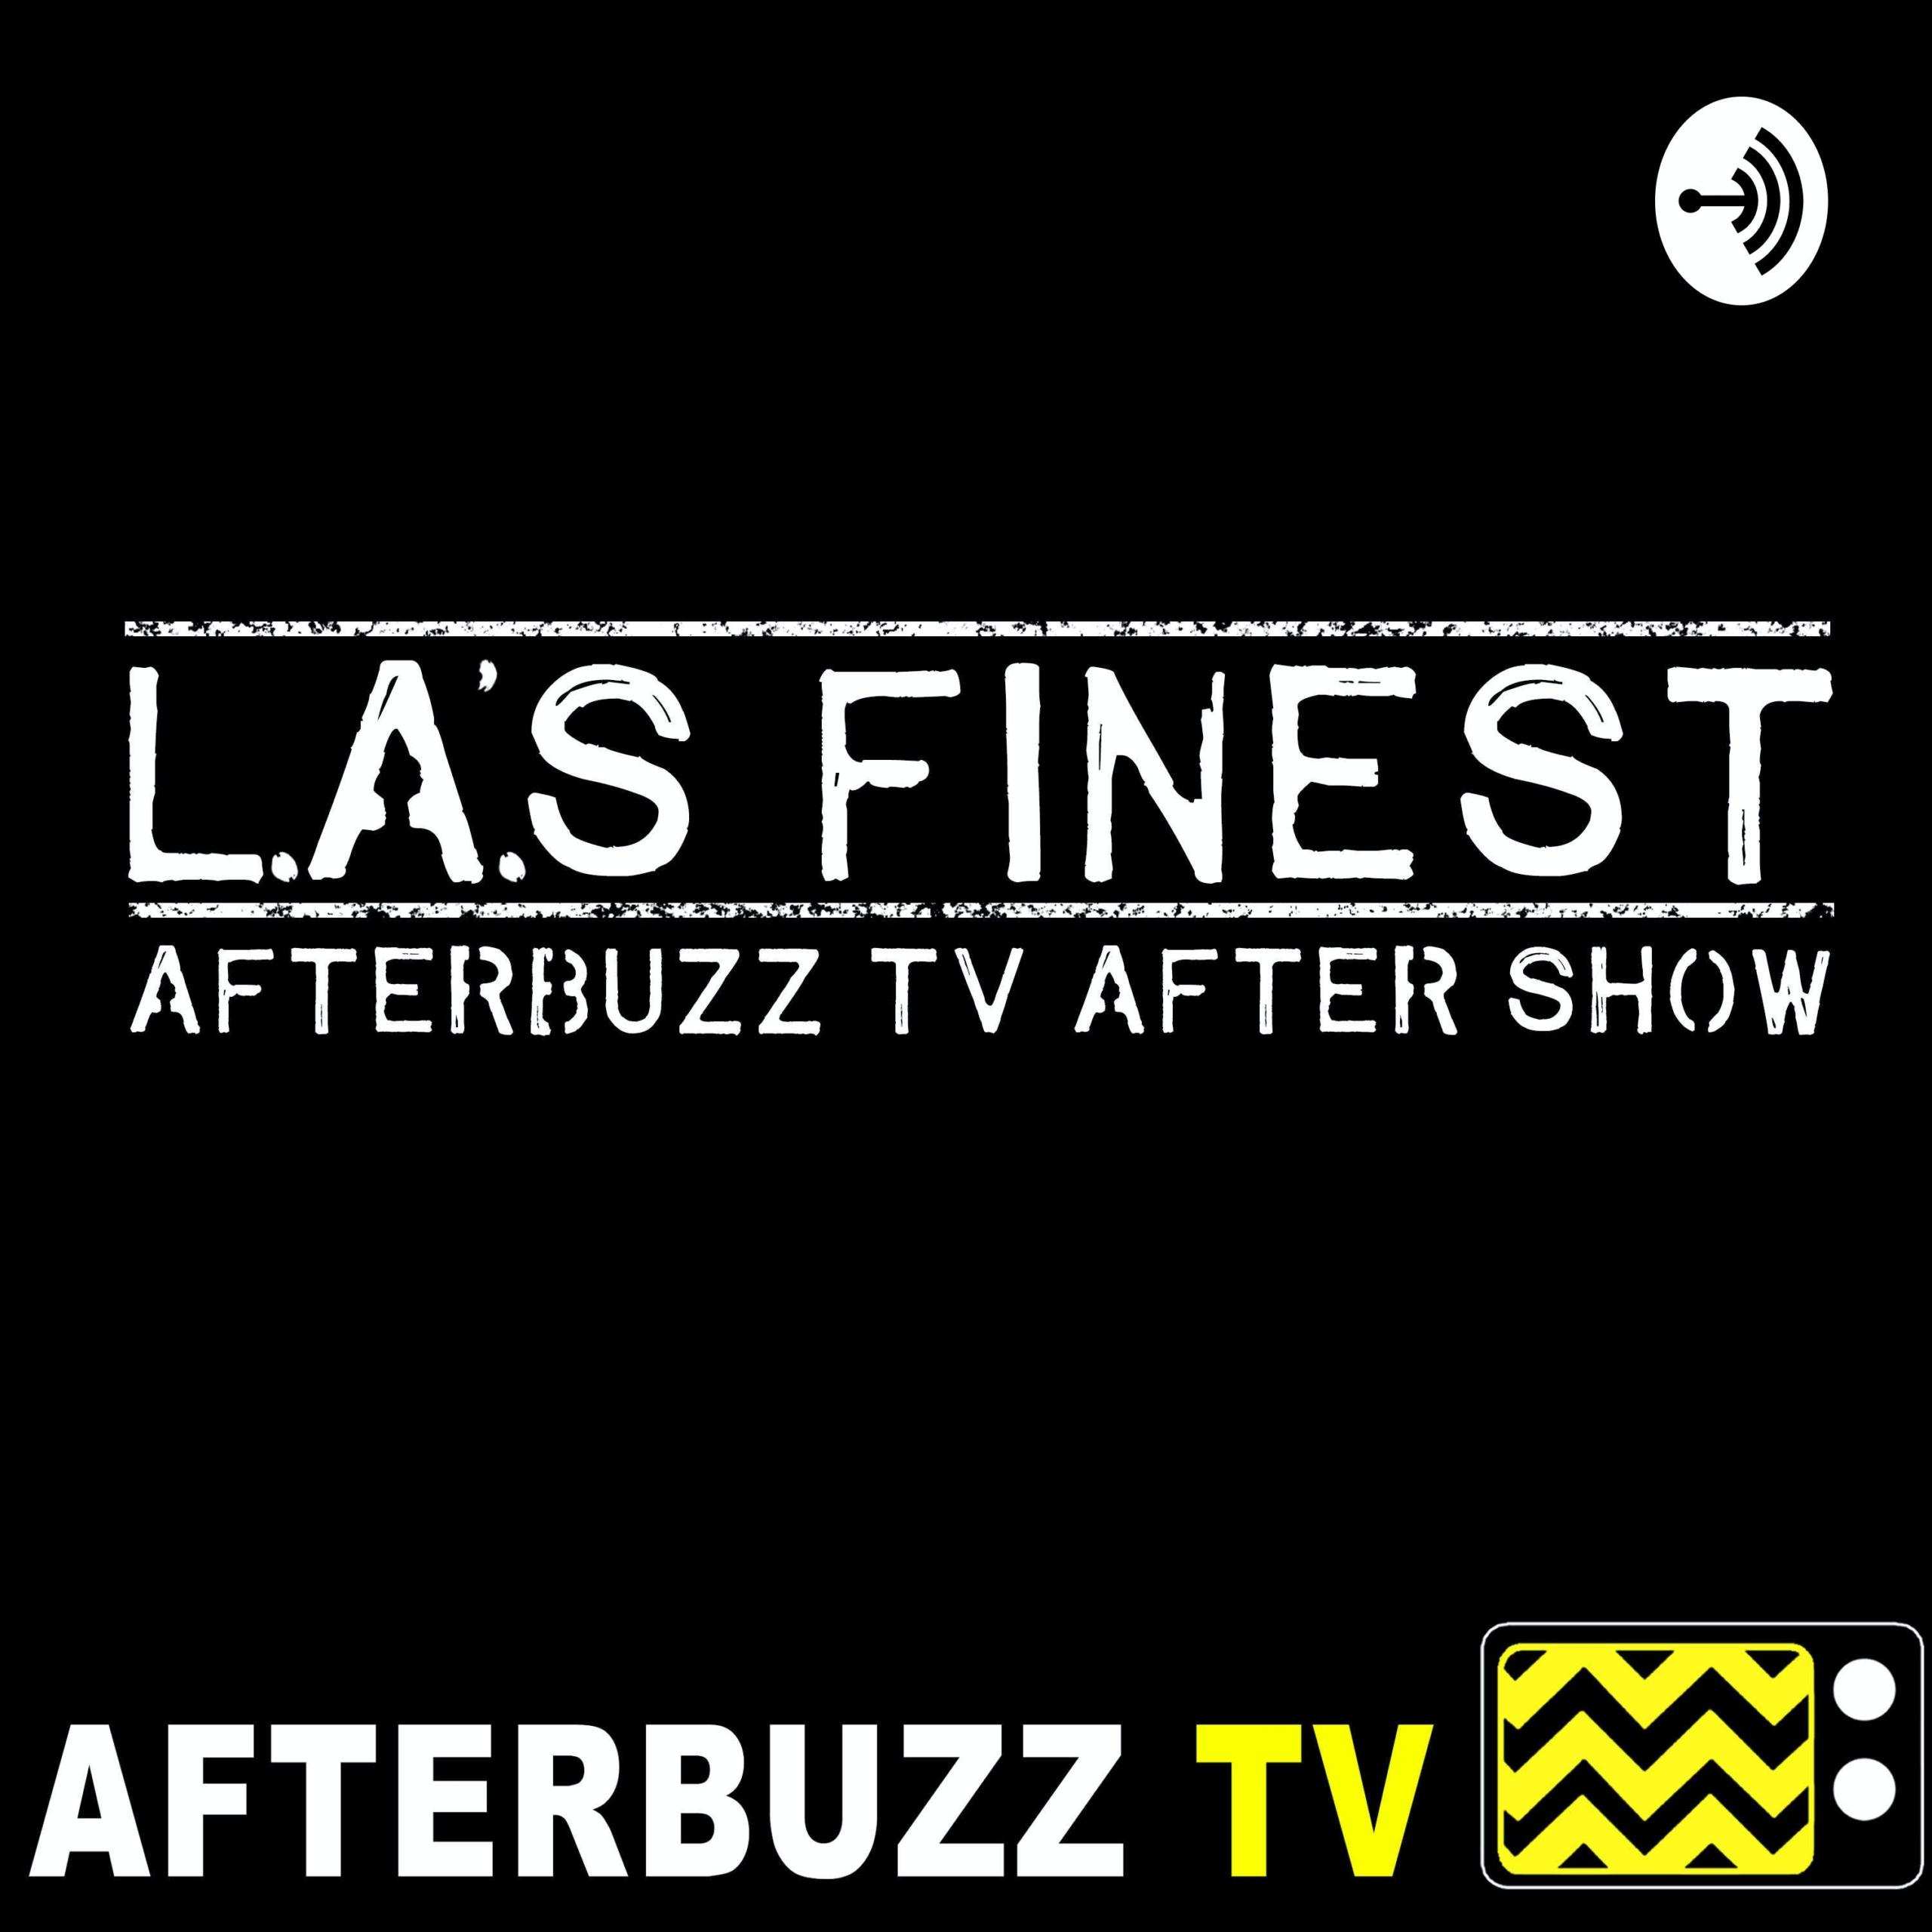 """Armageddon; Bad Girls"" Season 1 Episodes 12 & 13 'L.A.'s Finest' Review"